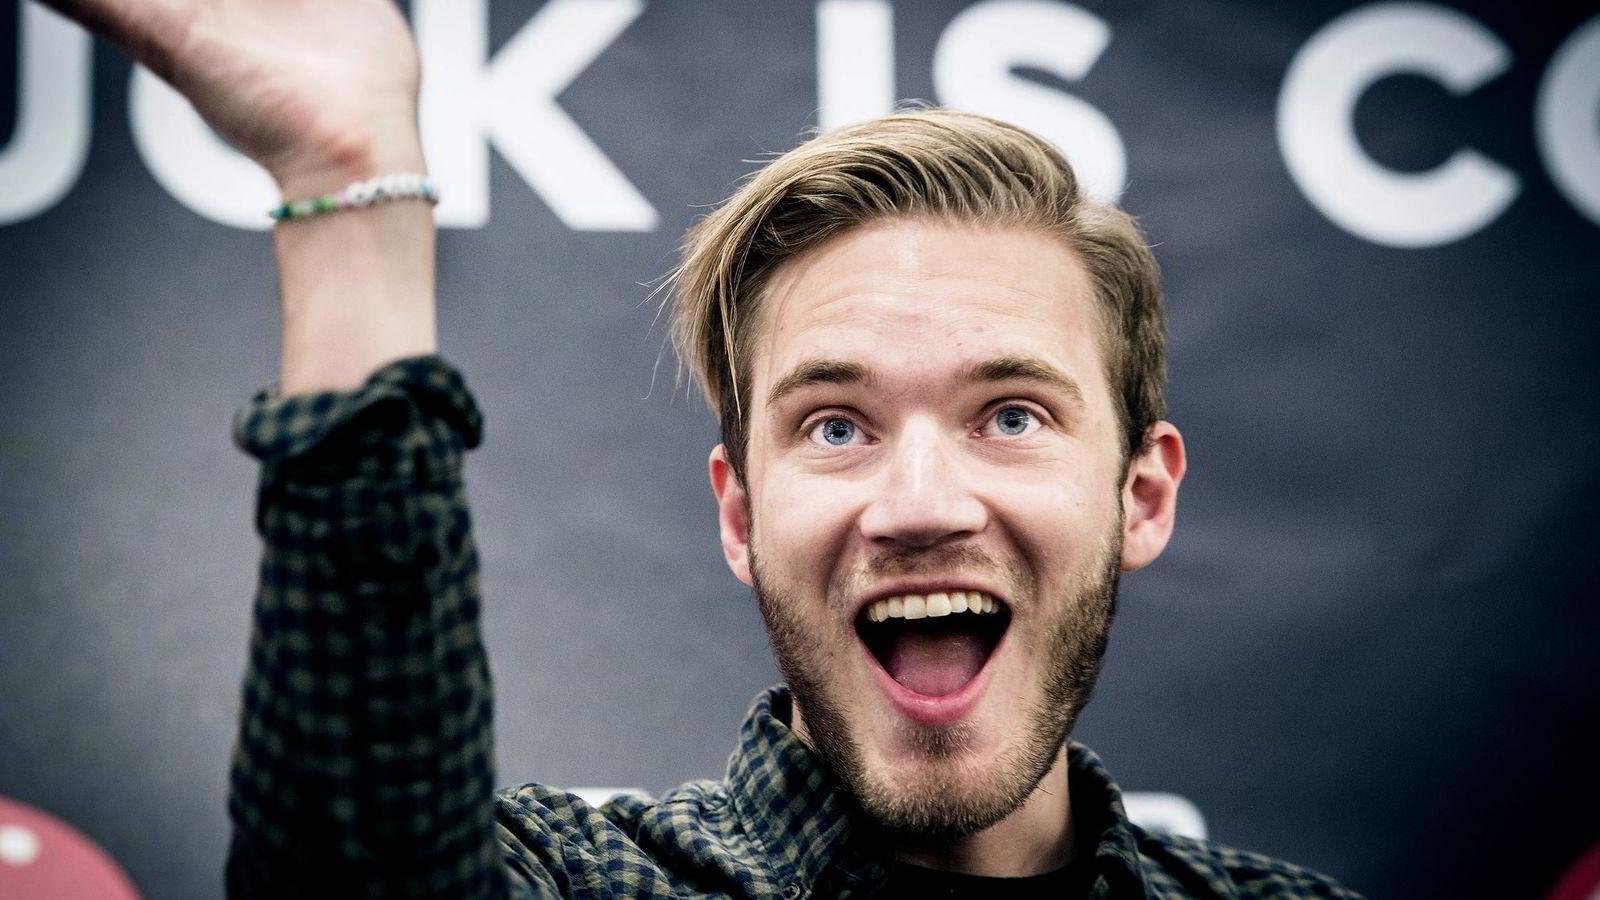 Youtubefenomenet Pewdiepie heter i virkeligheten Felix Kjellberg. Foto: Aftonbladet / IBL Bildbyrå